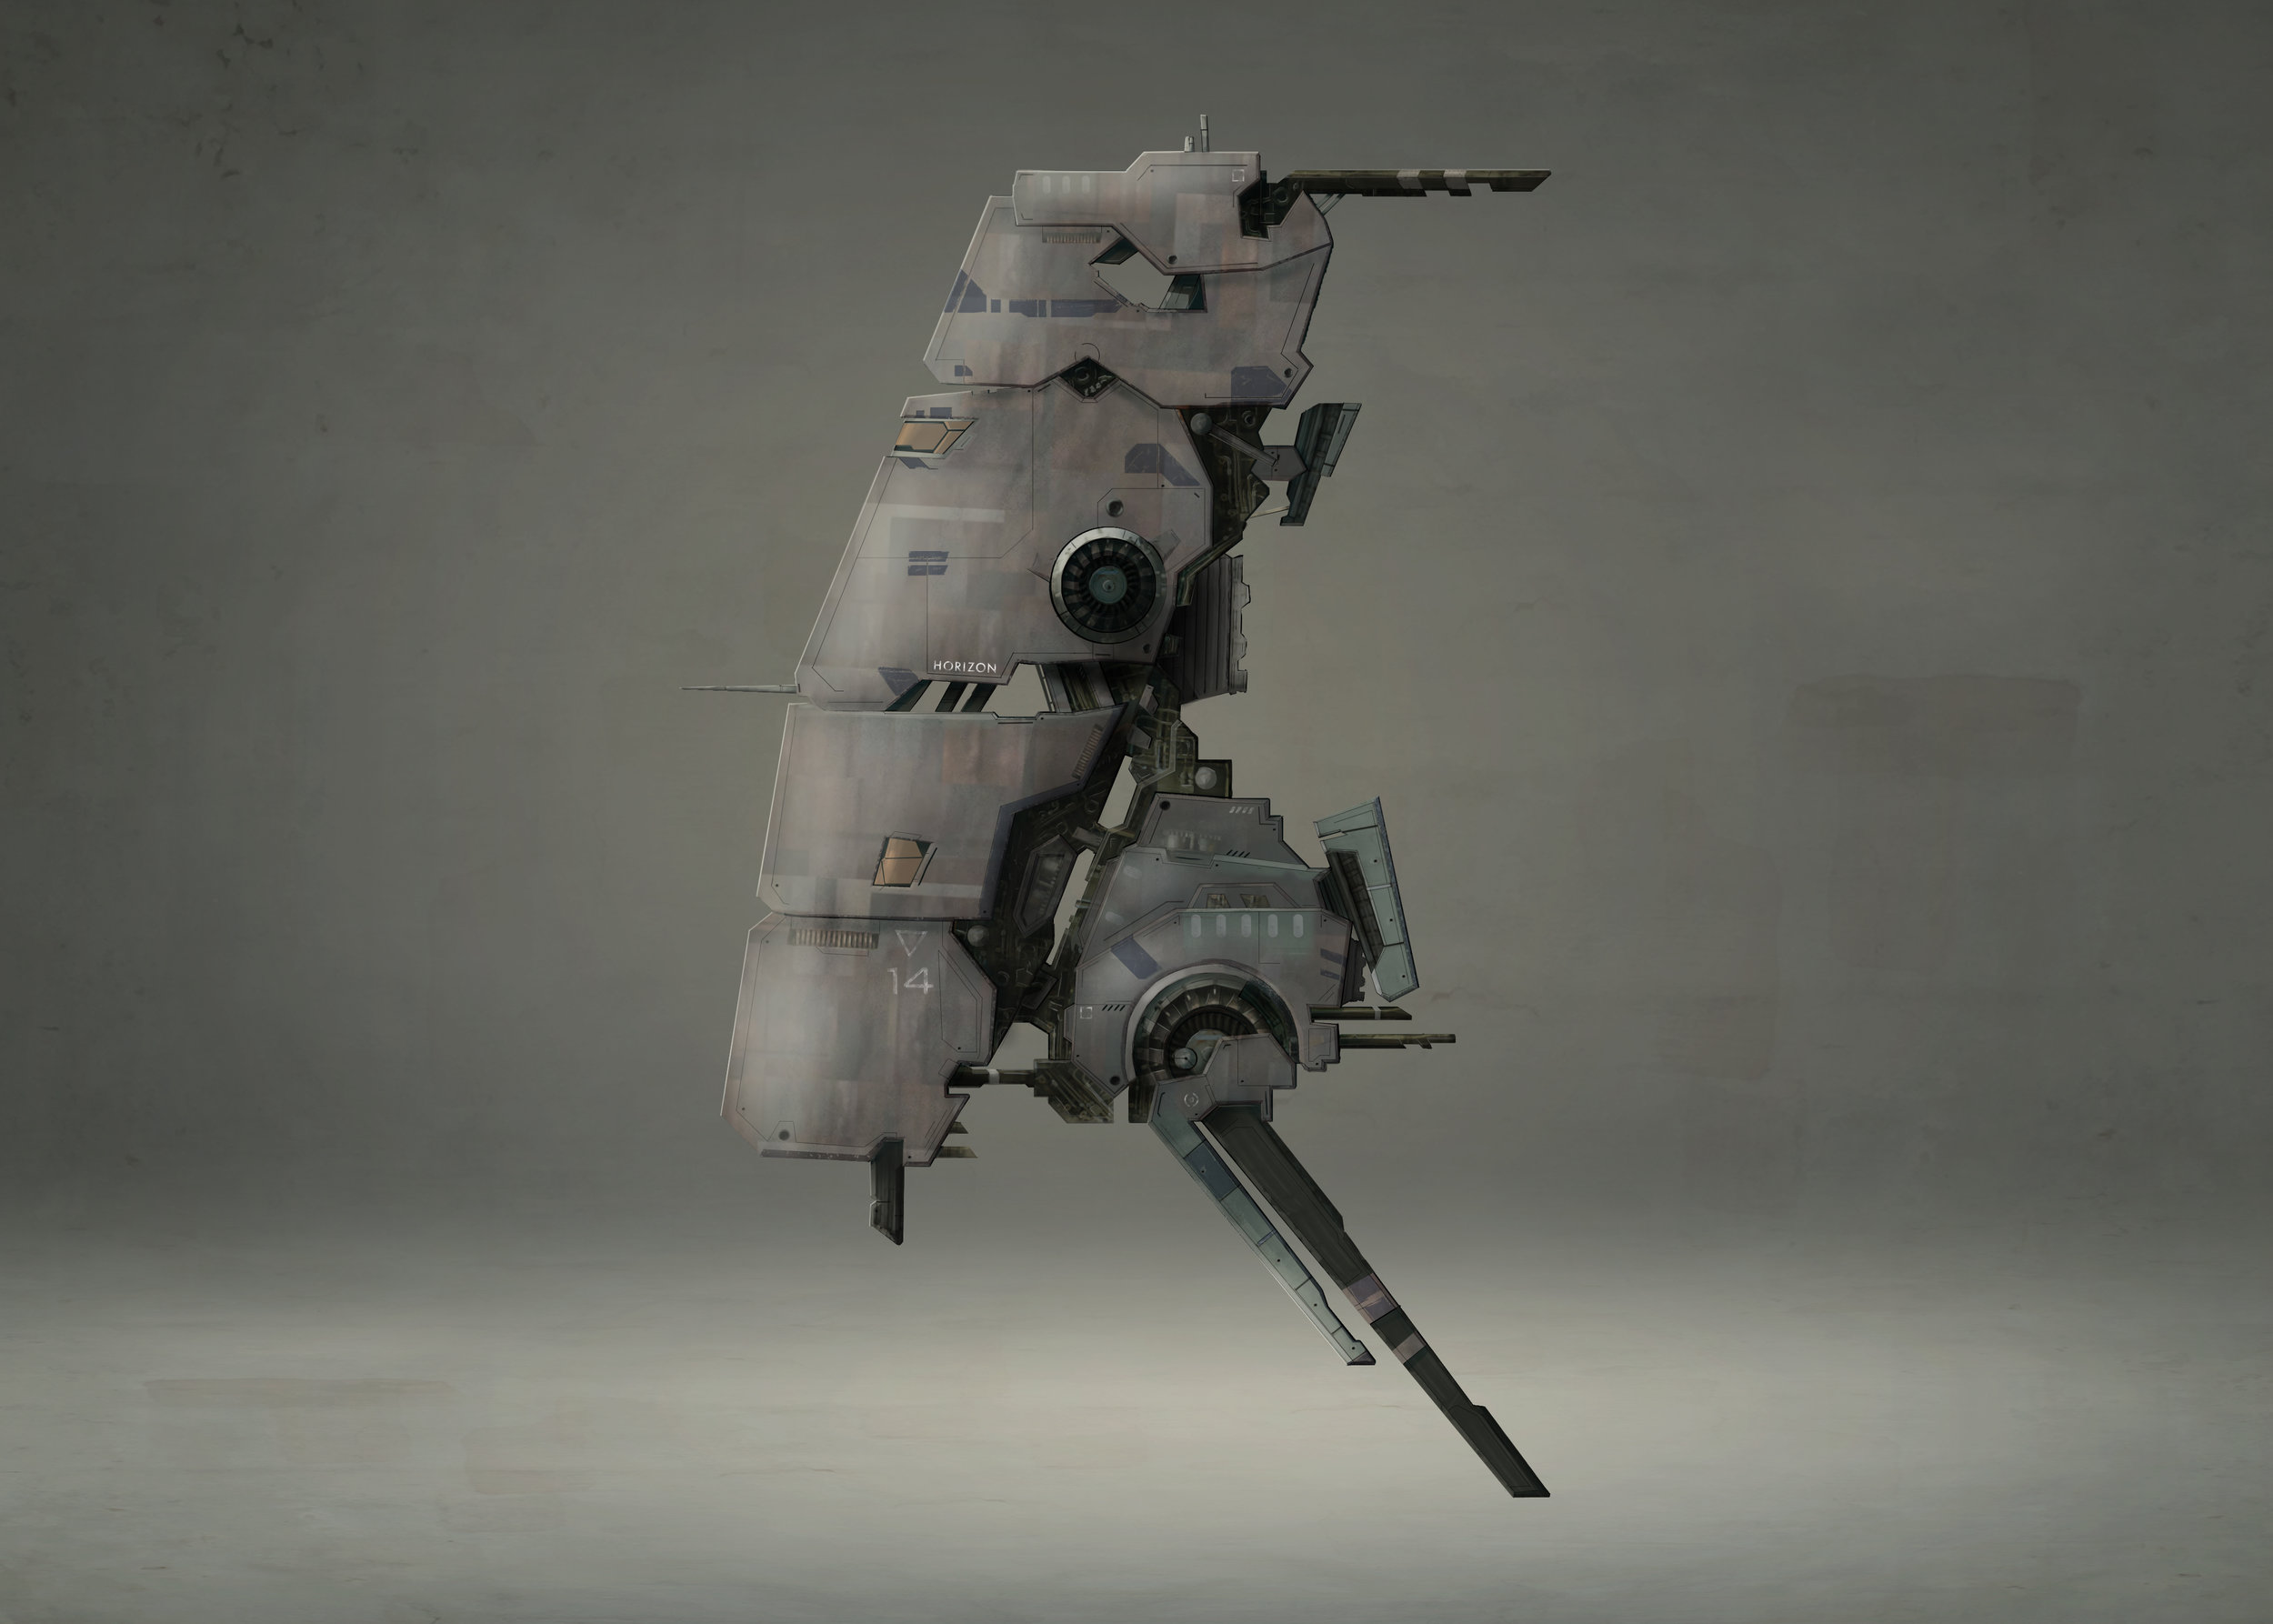 ApogeeSpaceship04.jpg